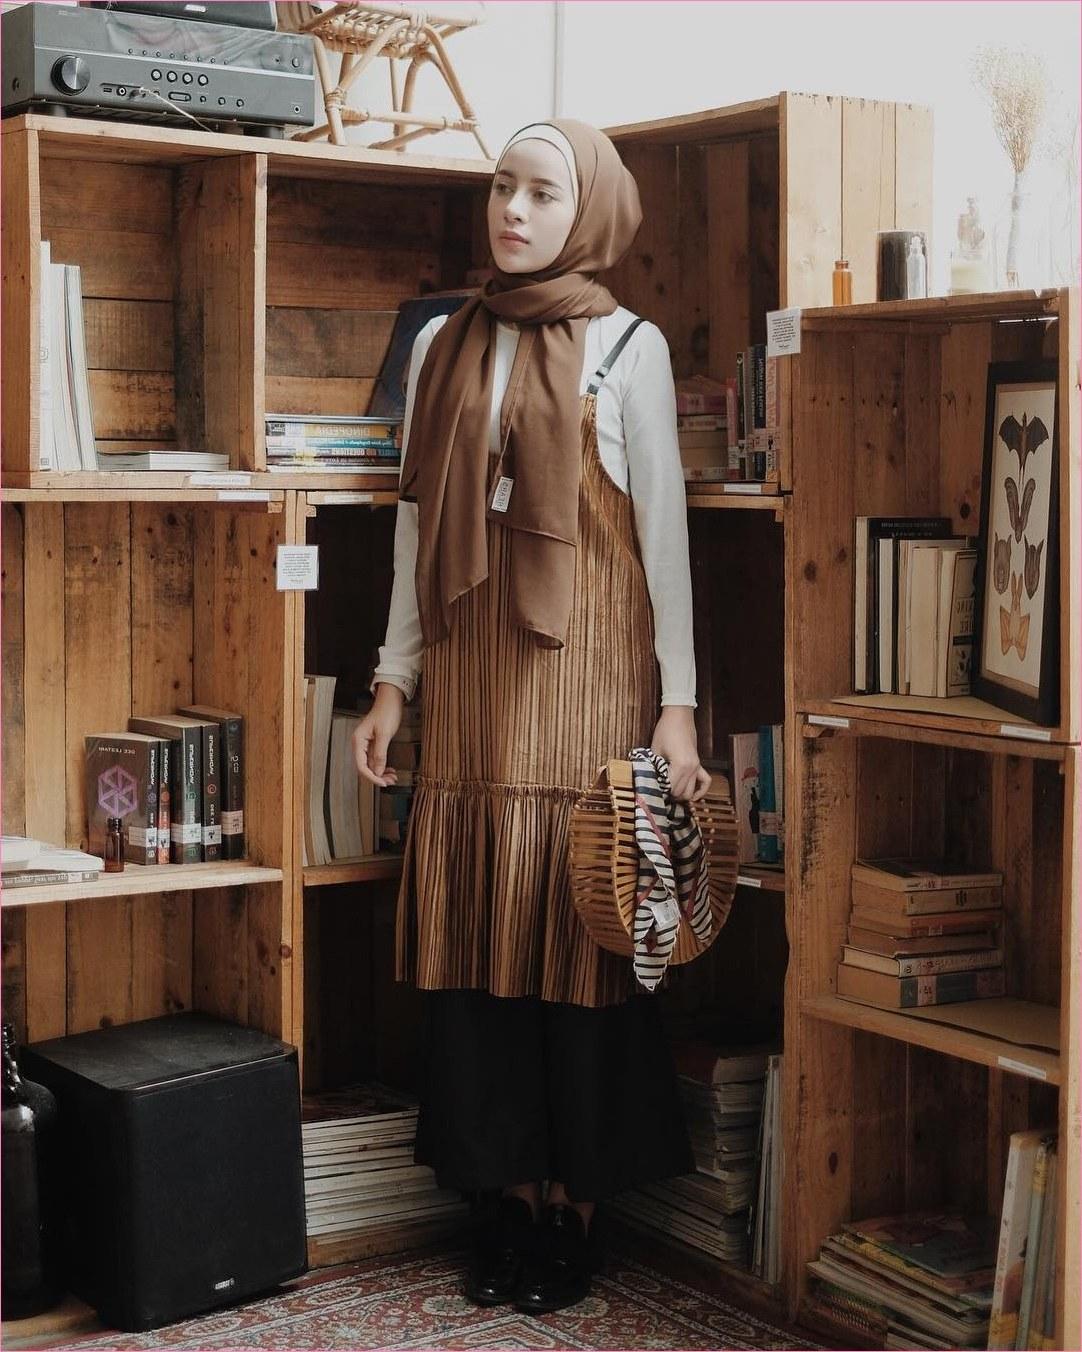 Model Baju Lebaran Model 2019 Nkde 80 Model Baju Lebaran Terbaru 2019 Muslimah Trendy Model